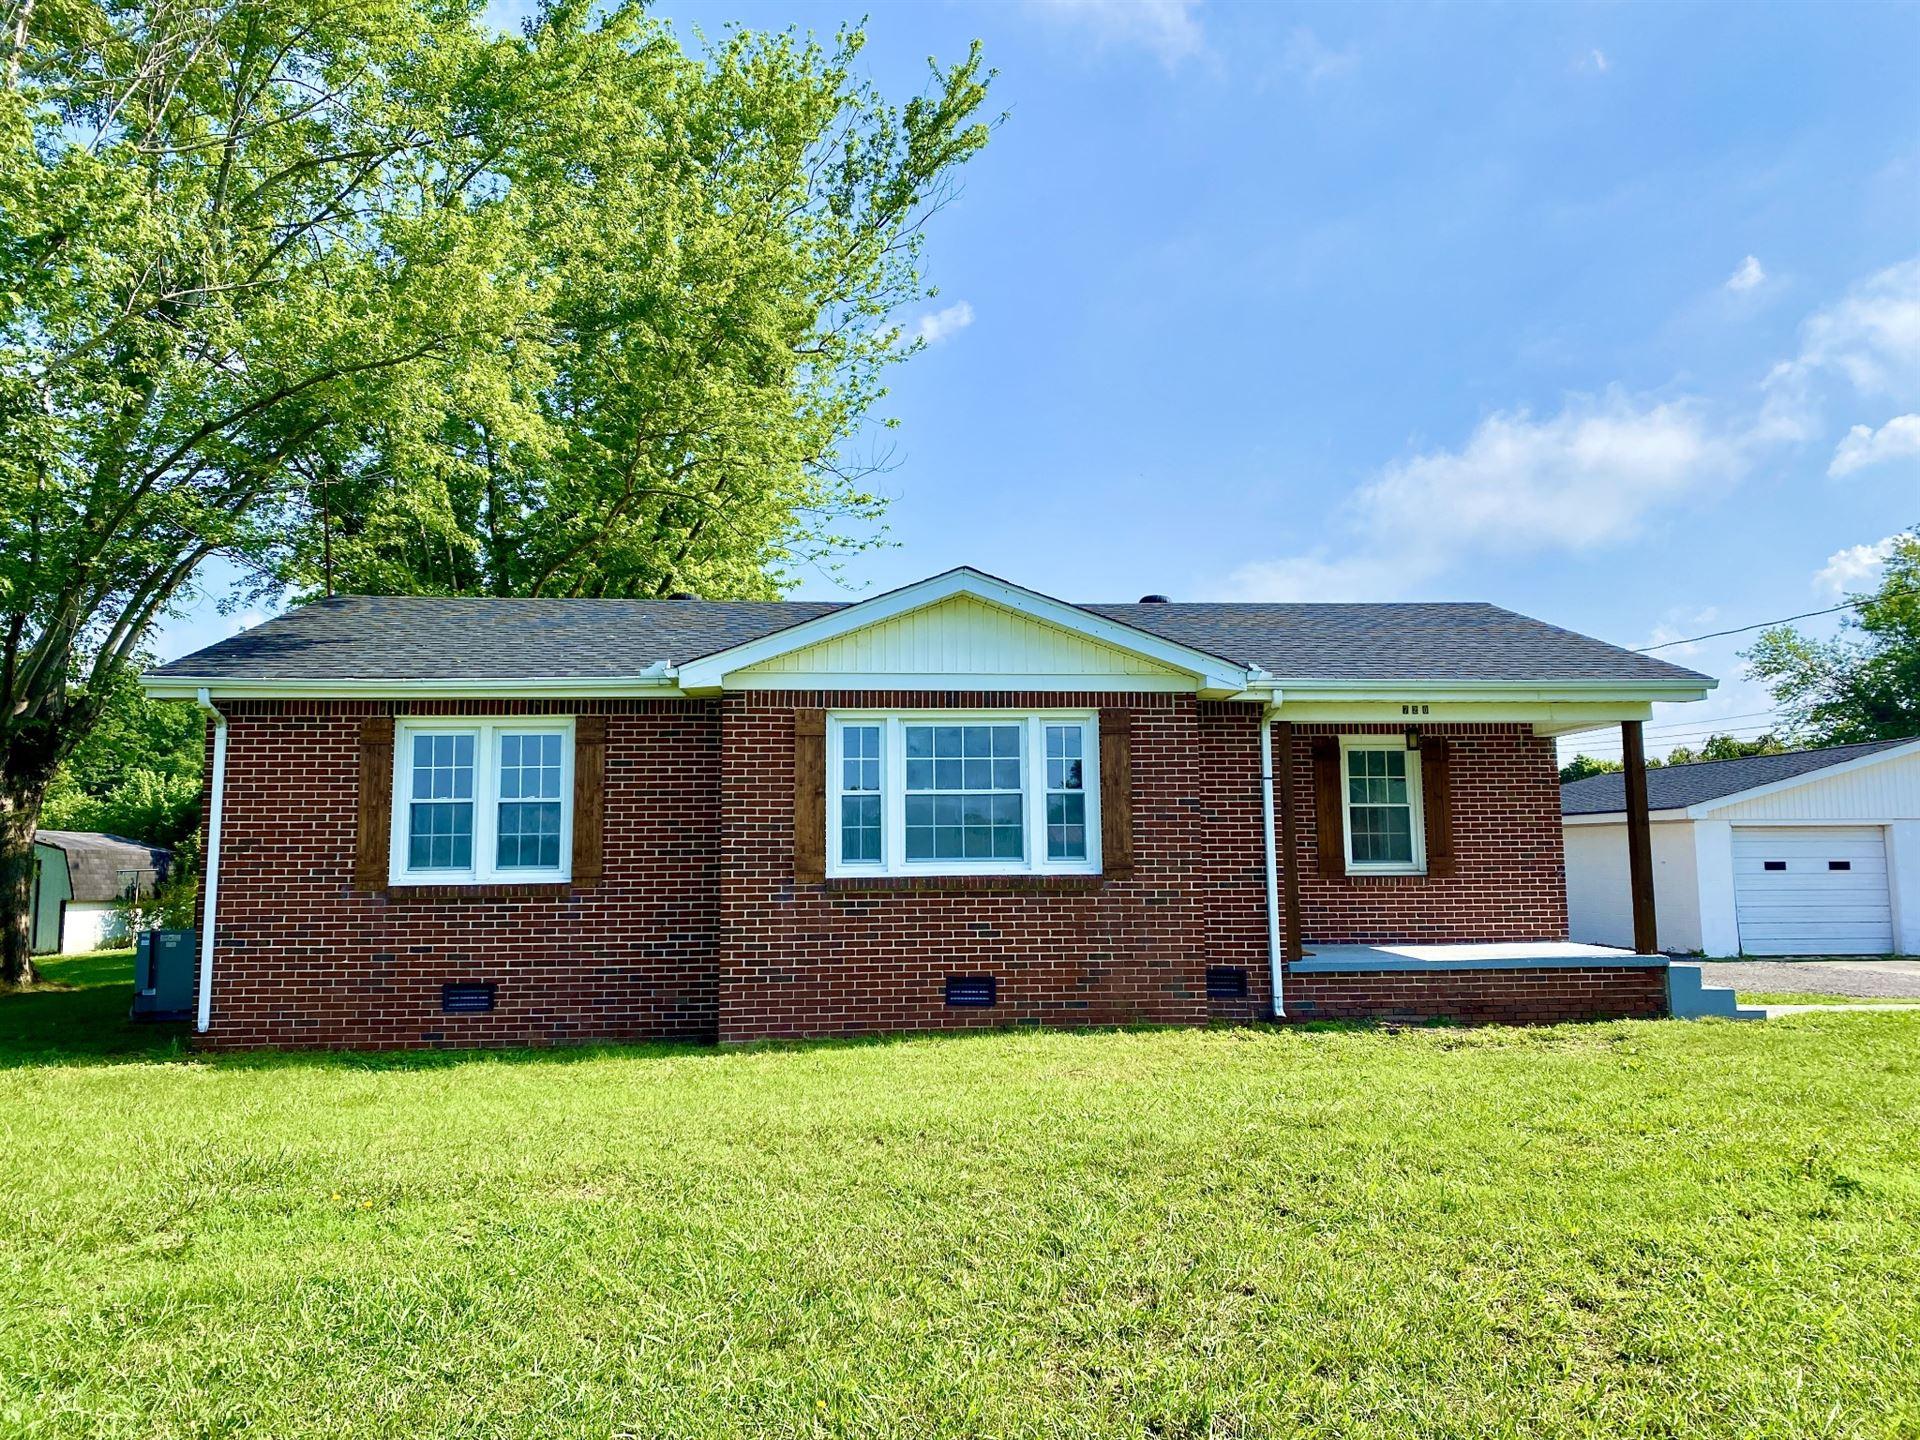 720 Dry Creek Rd, Smithville, TN 37166 - MLS#: 2261126